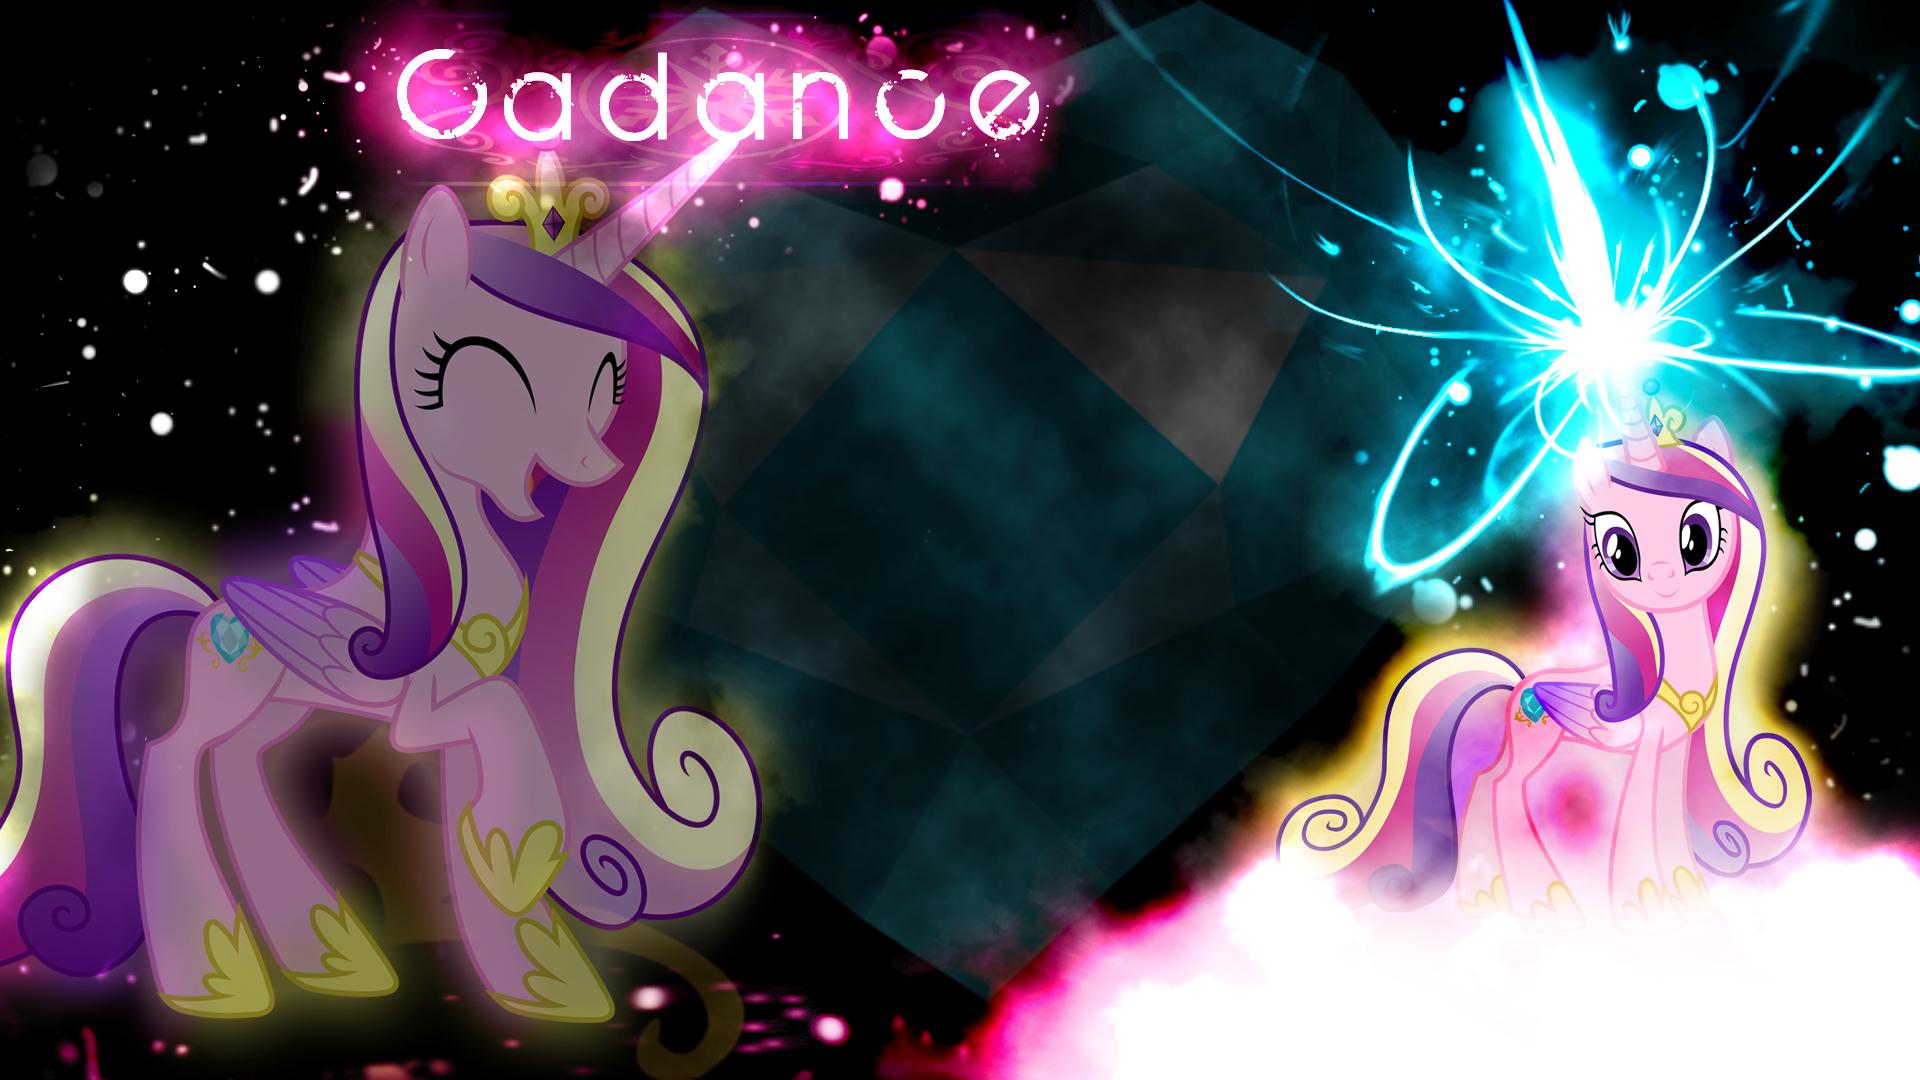 Princess Cadance Wallpaper V. 2 by Arakareeis on DeviantArt